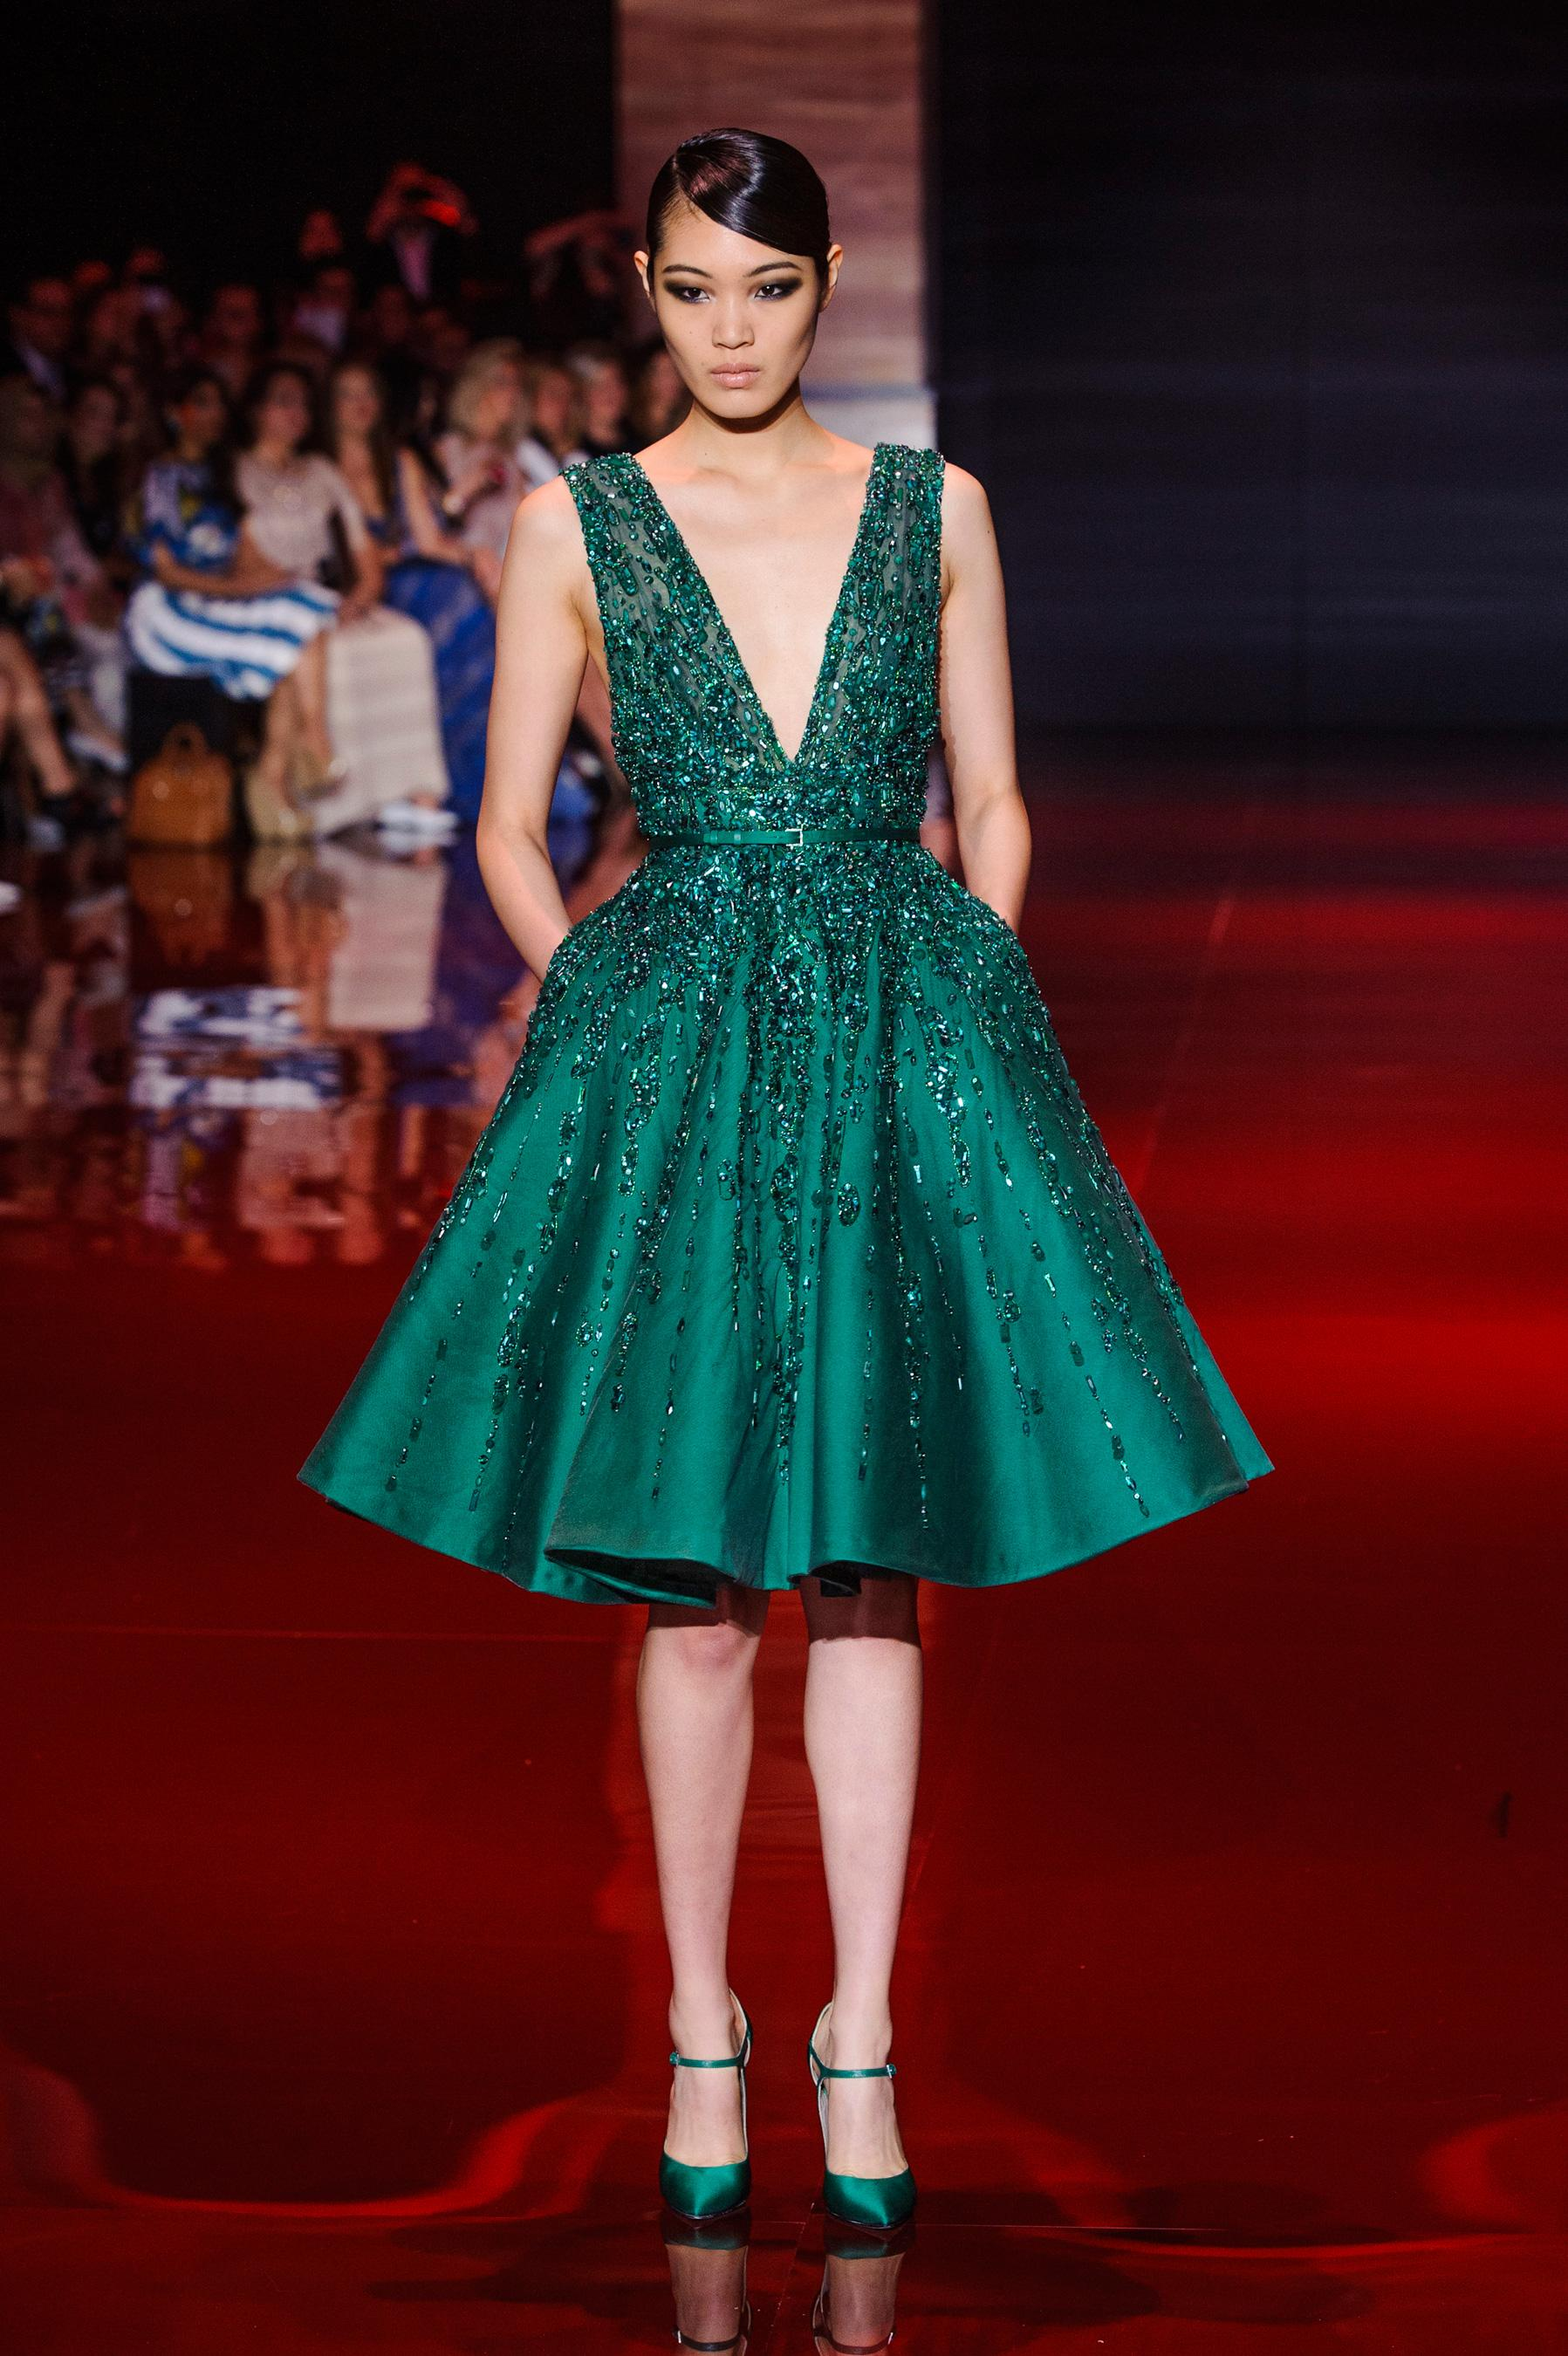 Robes de mode robes de soiree elie saab 2014 for Robes de mariage ellie saab